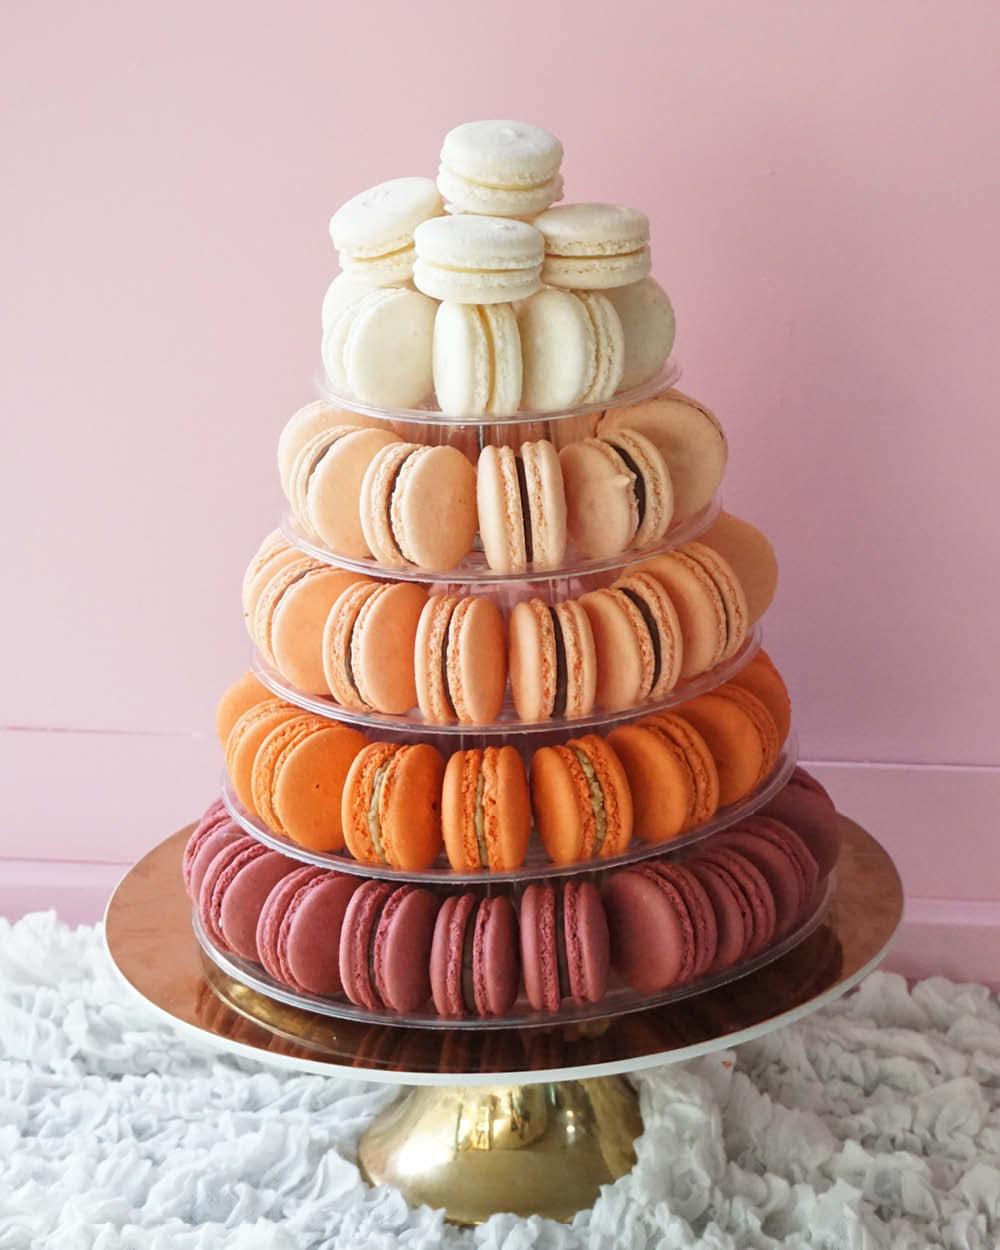 Cakes_By_Aranee_Perth_Drip_Cakes_Custom_Cakes_Wedding_Cakes_Macarons_Cupcakes_Personalised_Cookies_OTHER_DESSERTS_Gallery11.jpg